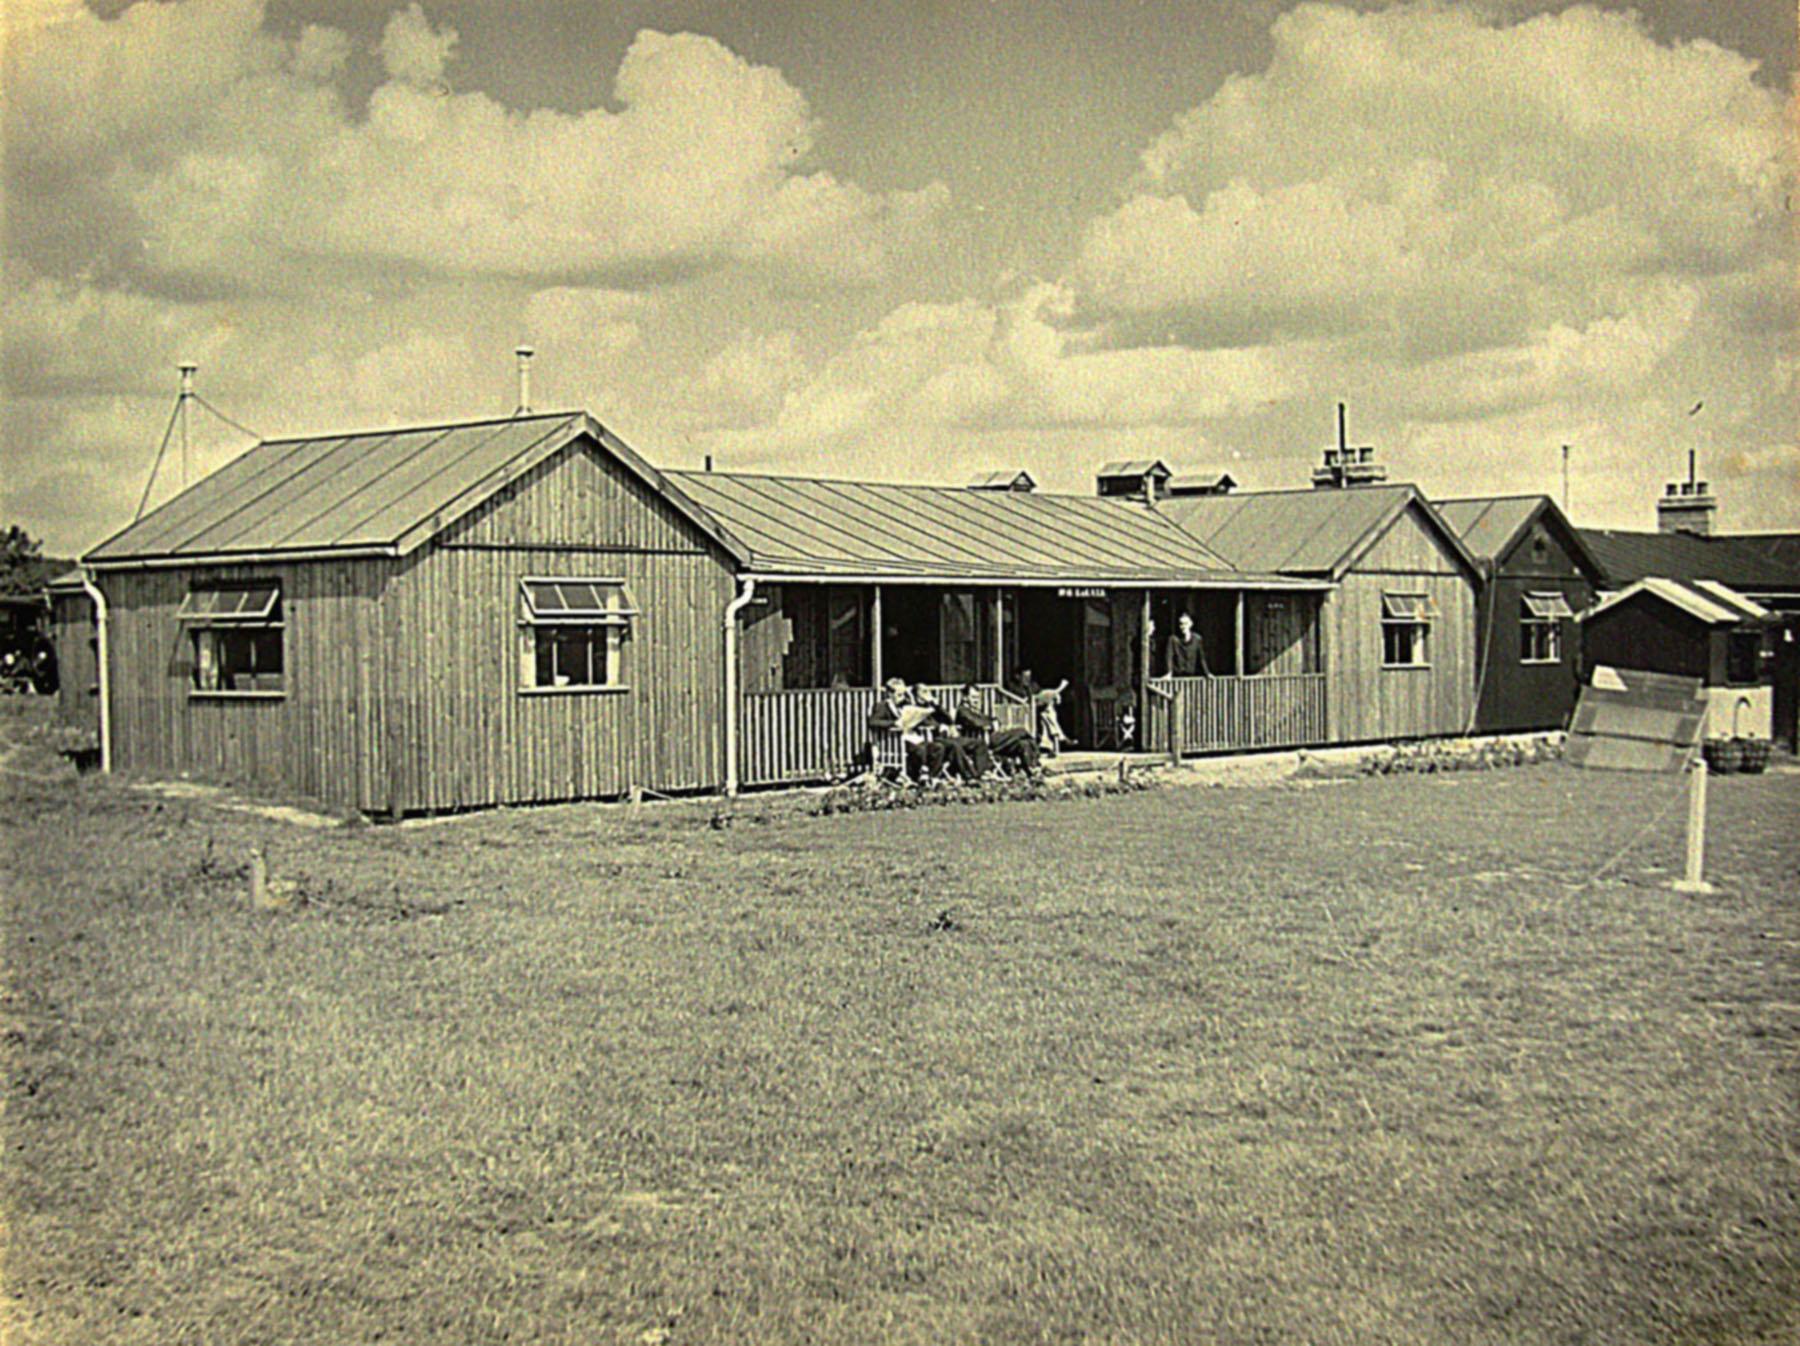 RAF Watch Office photo taken by Patrick Hayes KIA July 7 1940 02